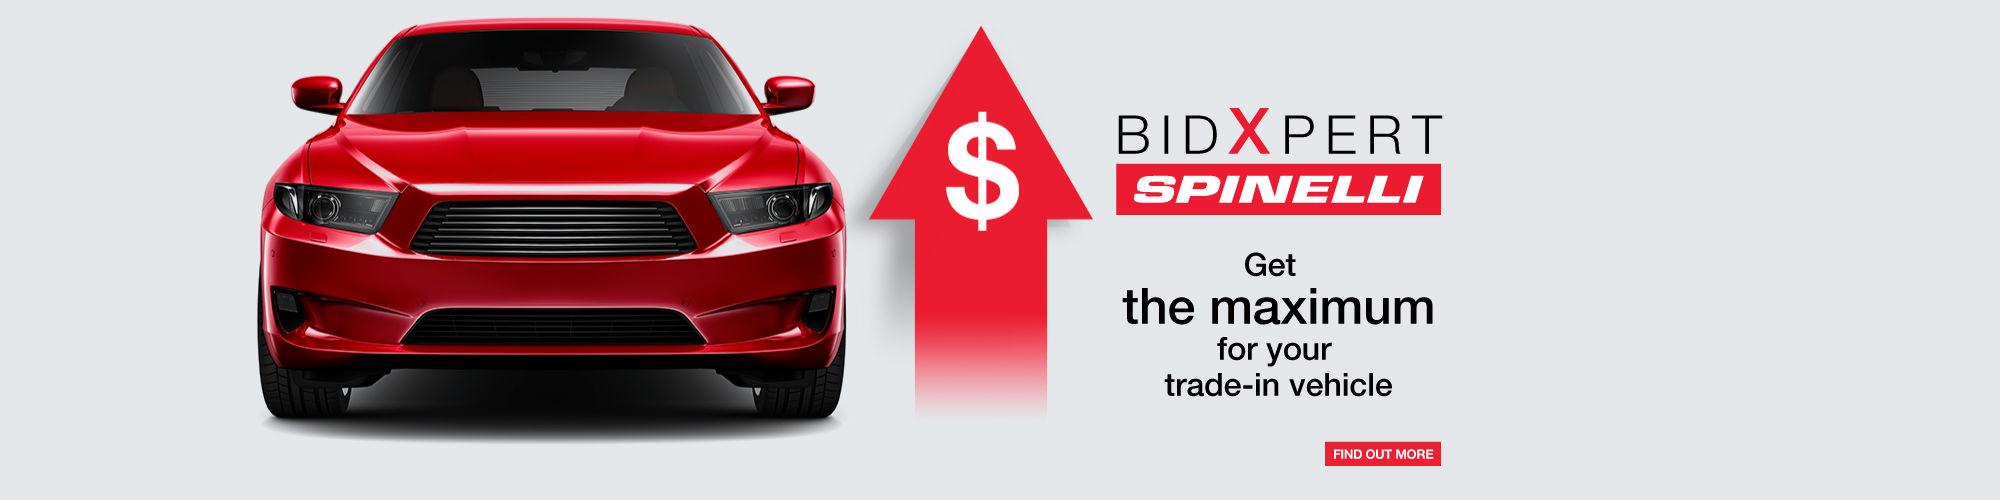 Spinelli BidXpert